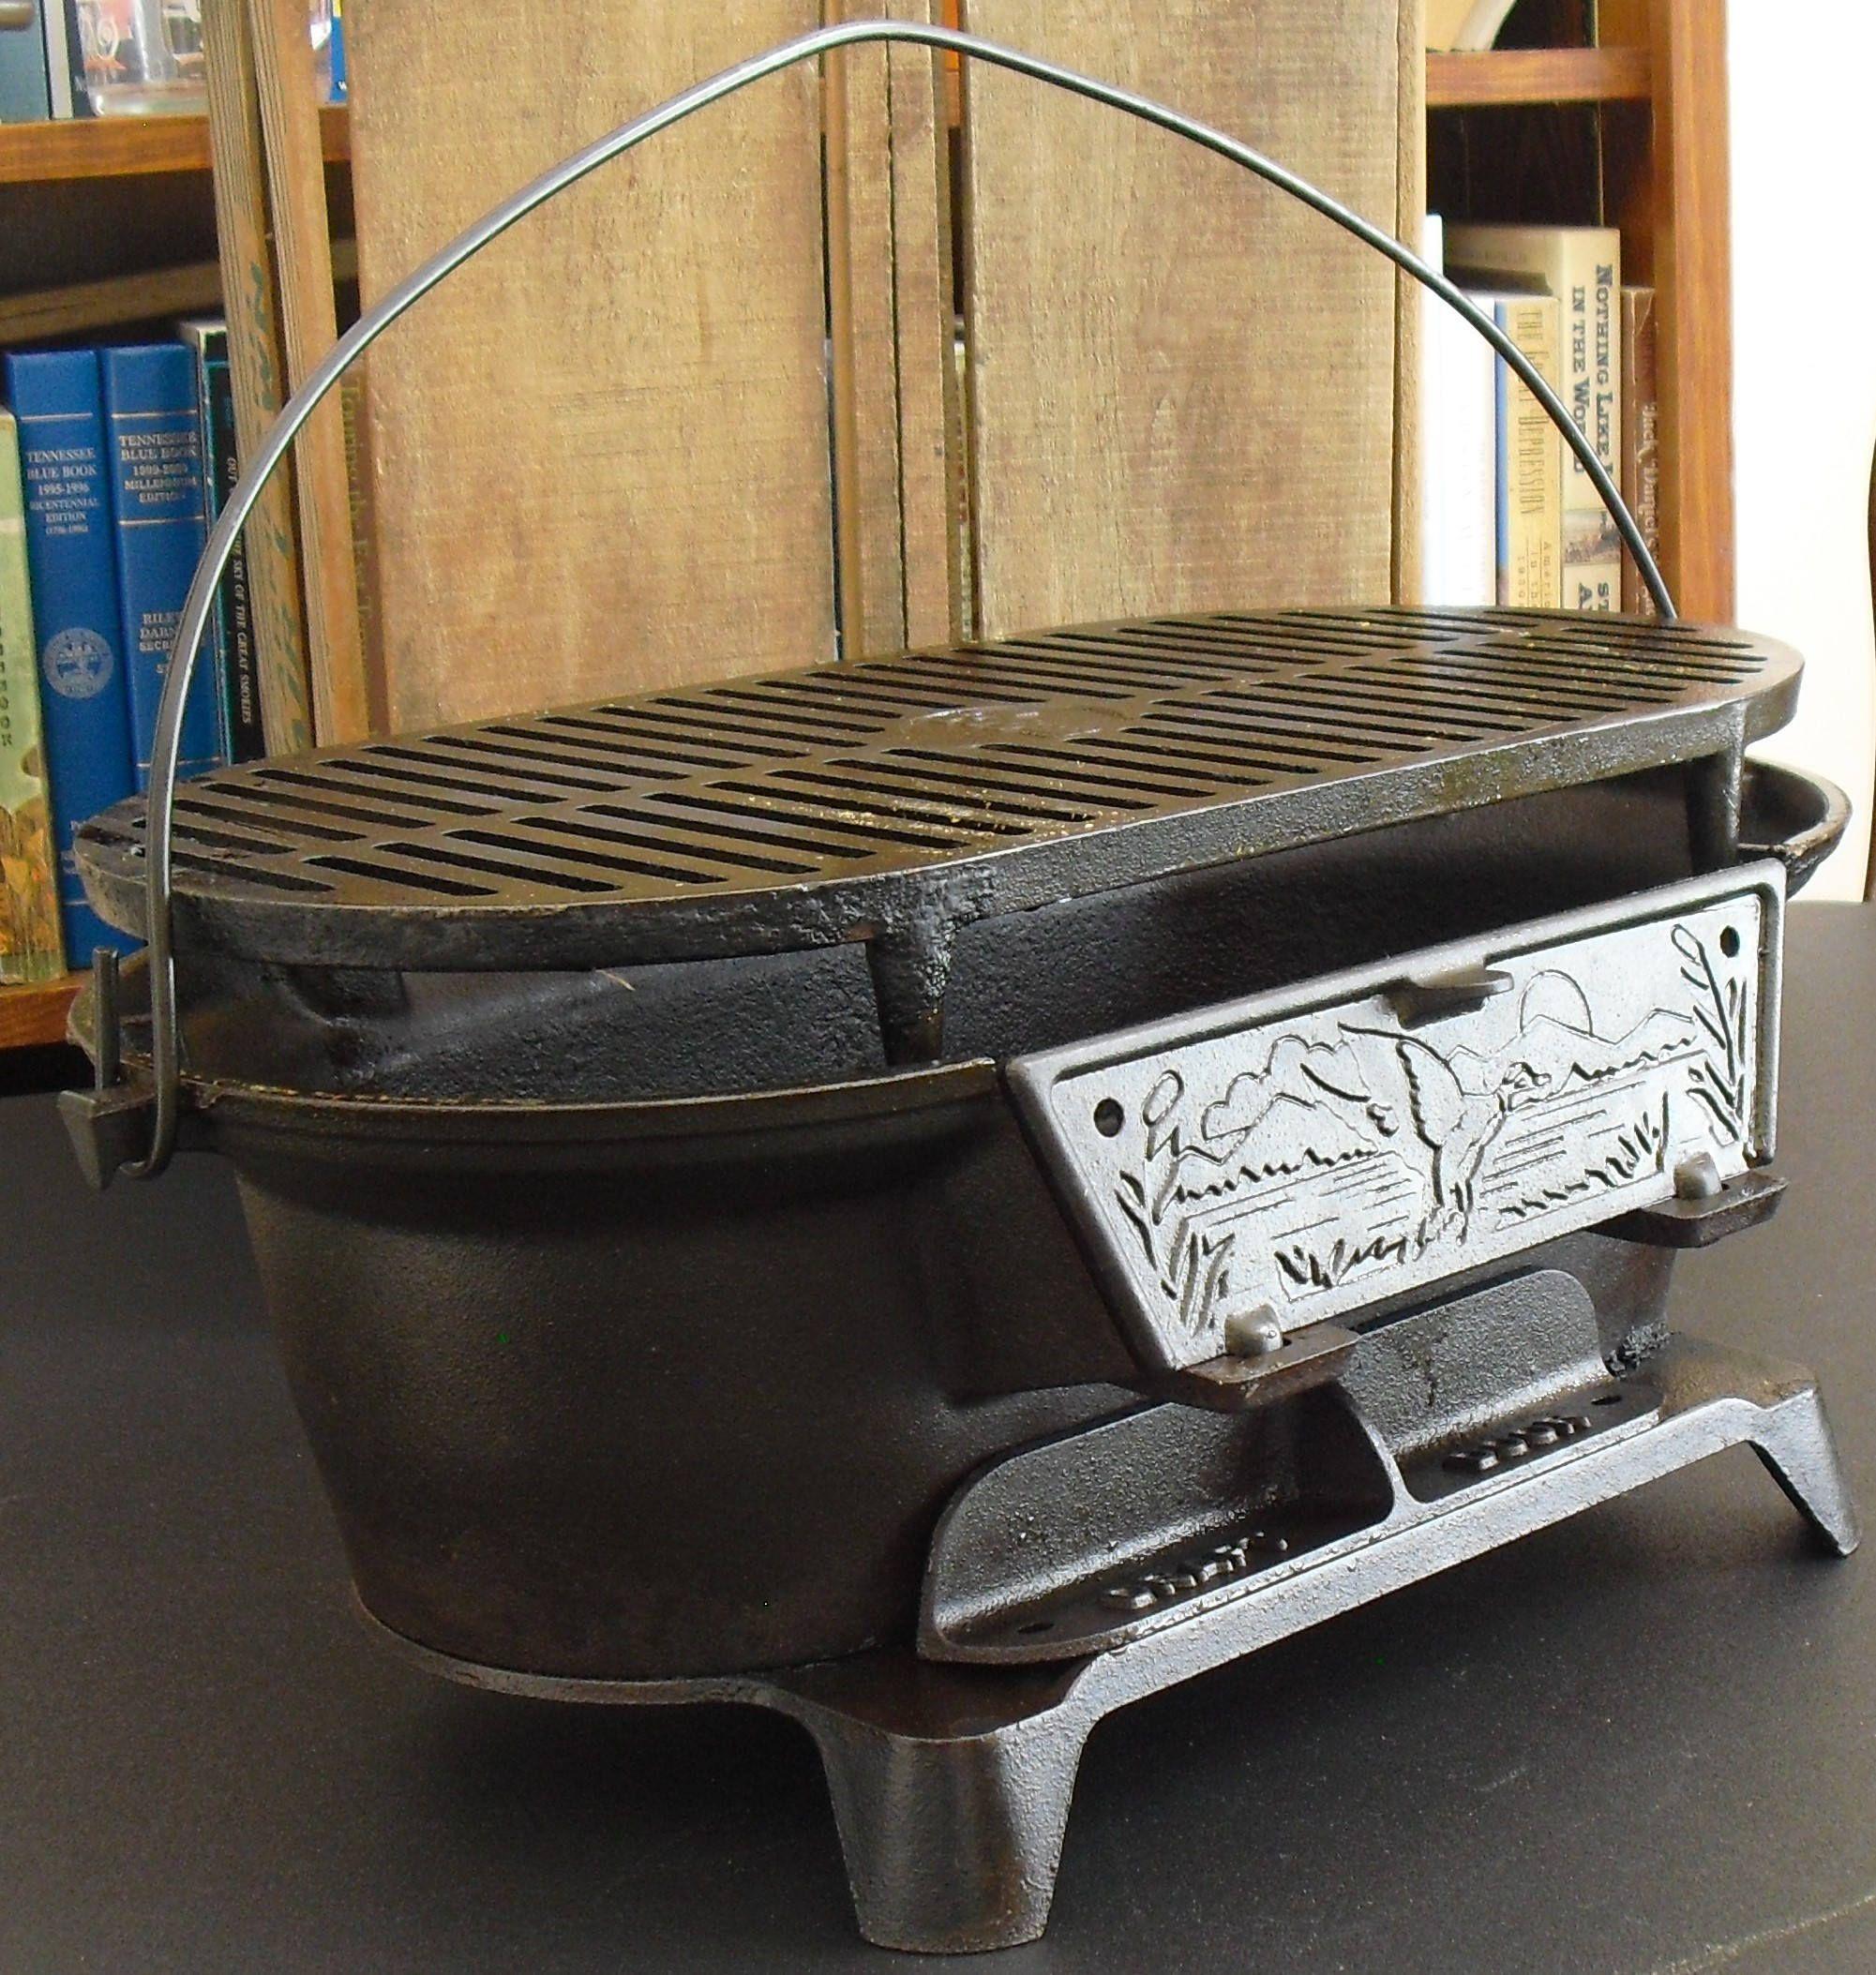 Vintage Lodge Cast Iron Charcoal Sportsman Hibachi Grill, American  Wildlife, Portable Stove